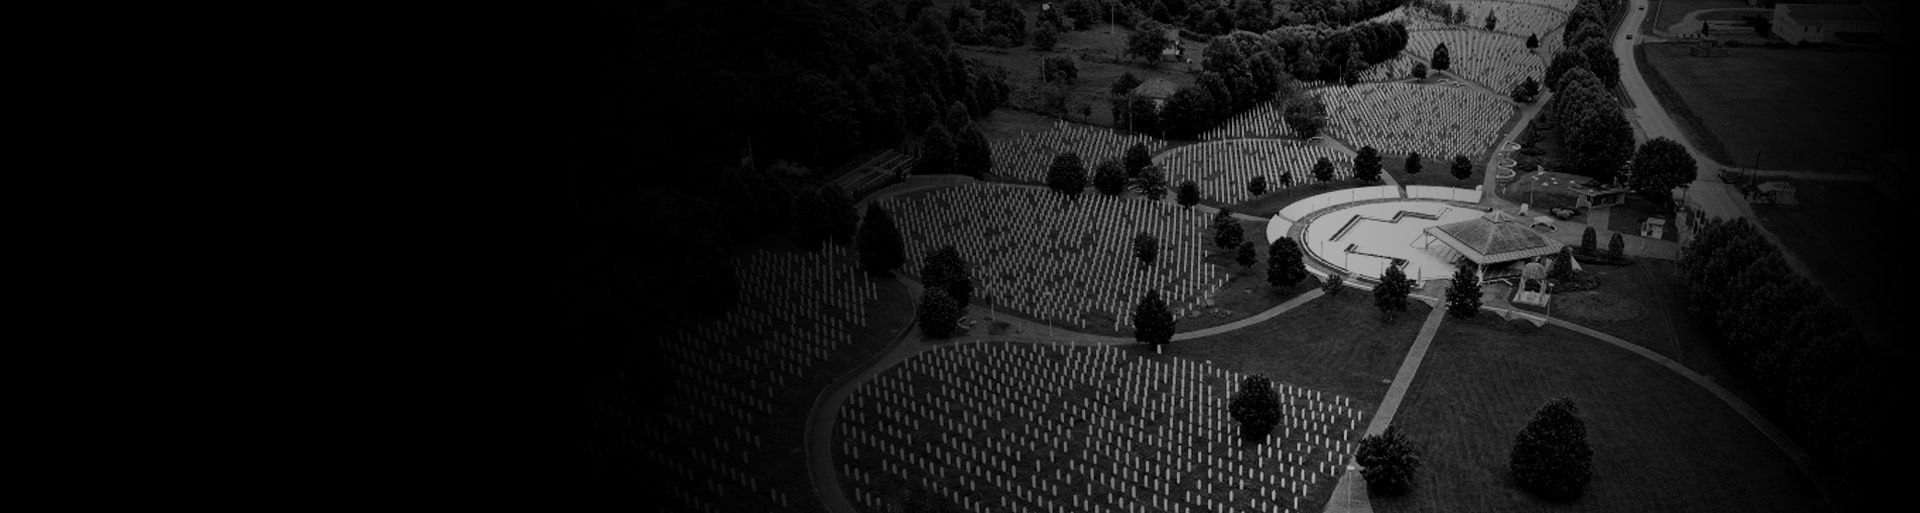 Srebrenica Memorial Center